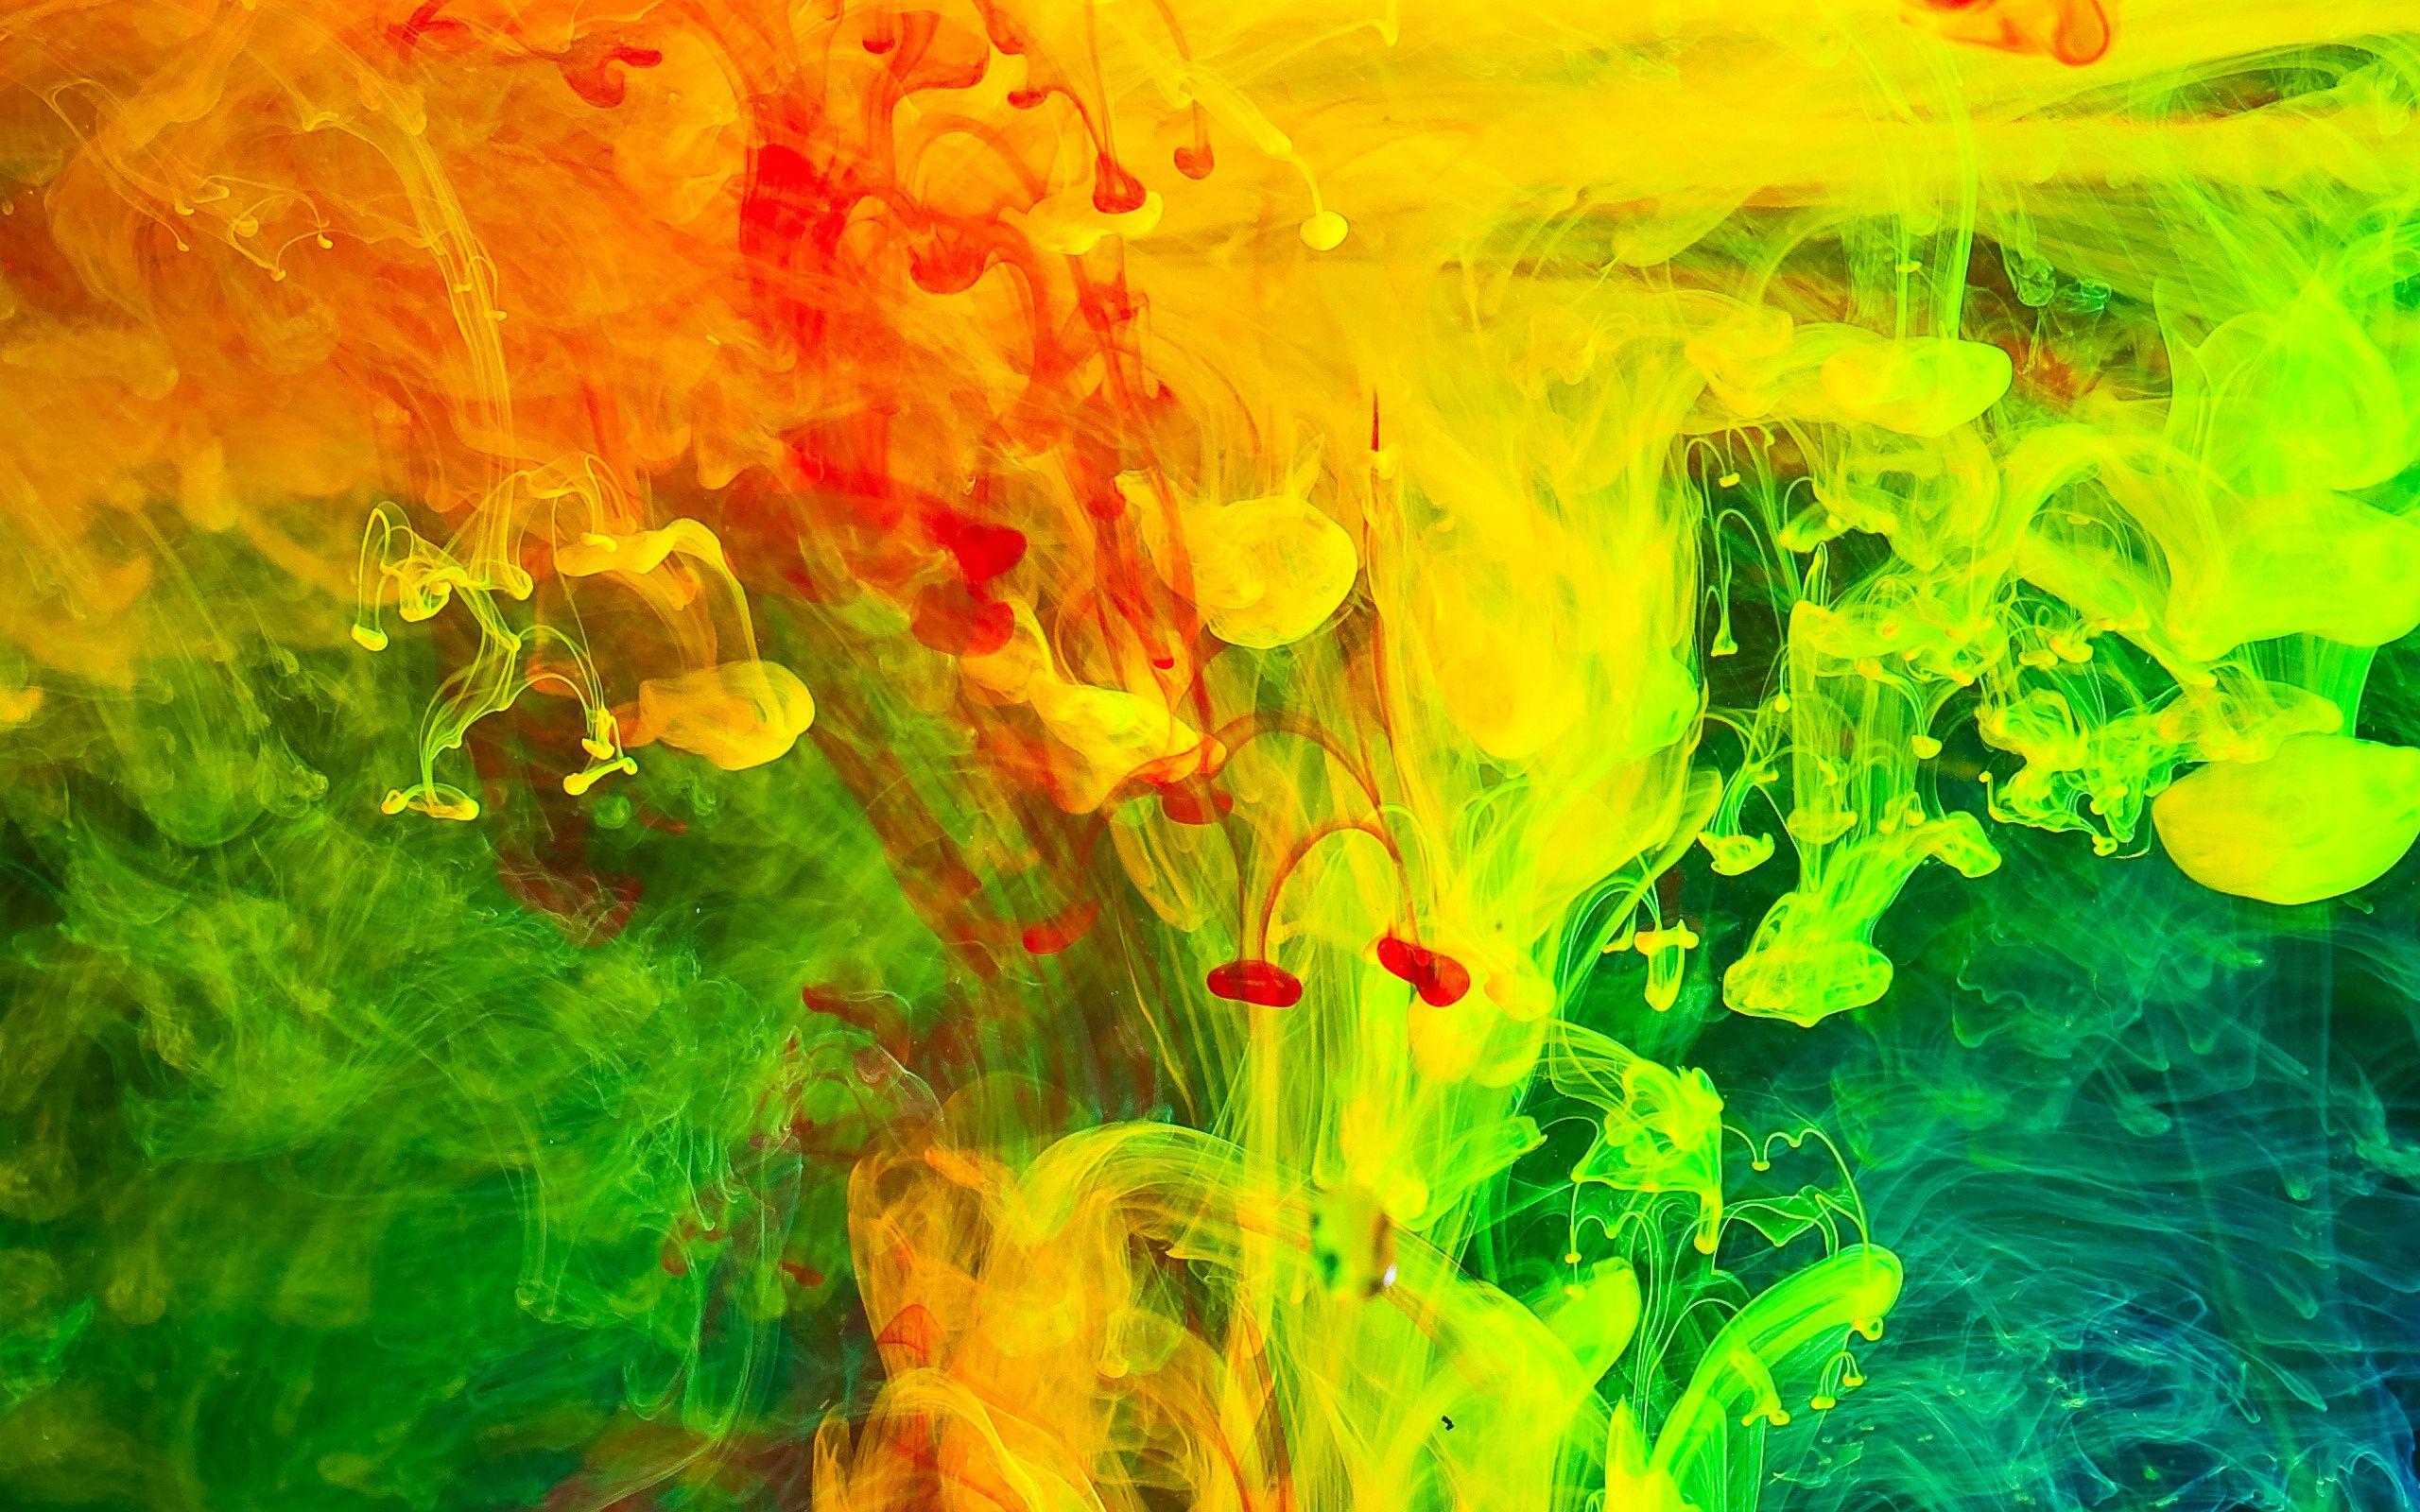 Art Wallsev Com Download Free Hd Wallpapers Painting Wallpaper Artistic Wallpaper Art Background